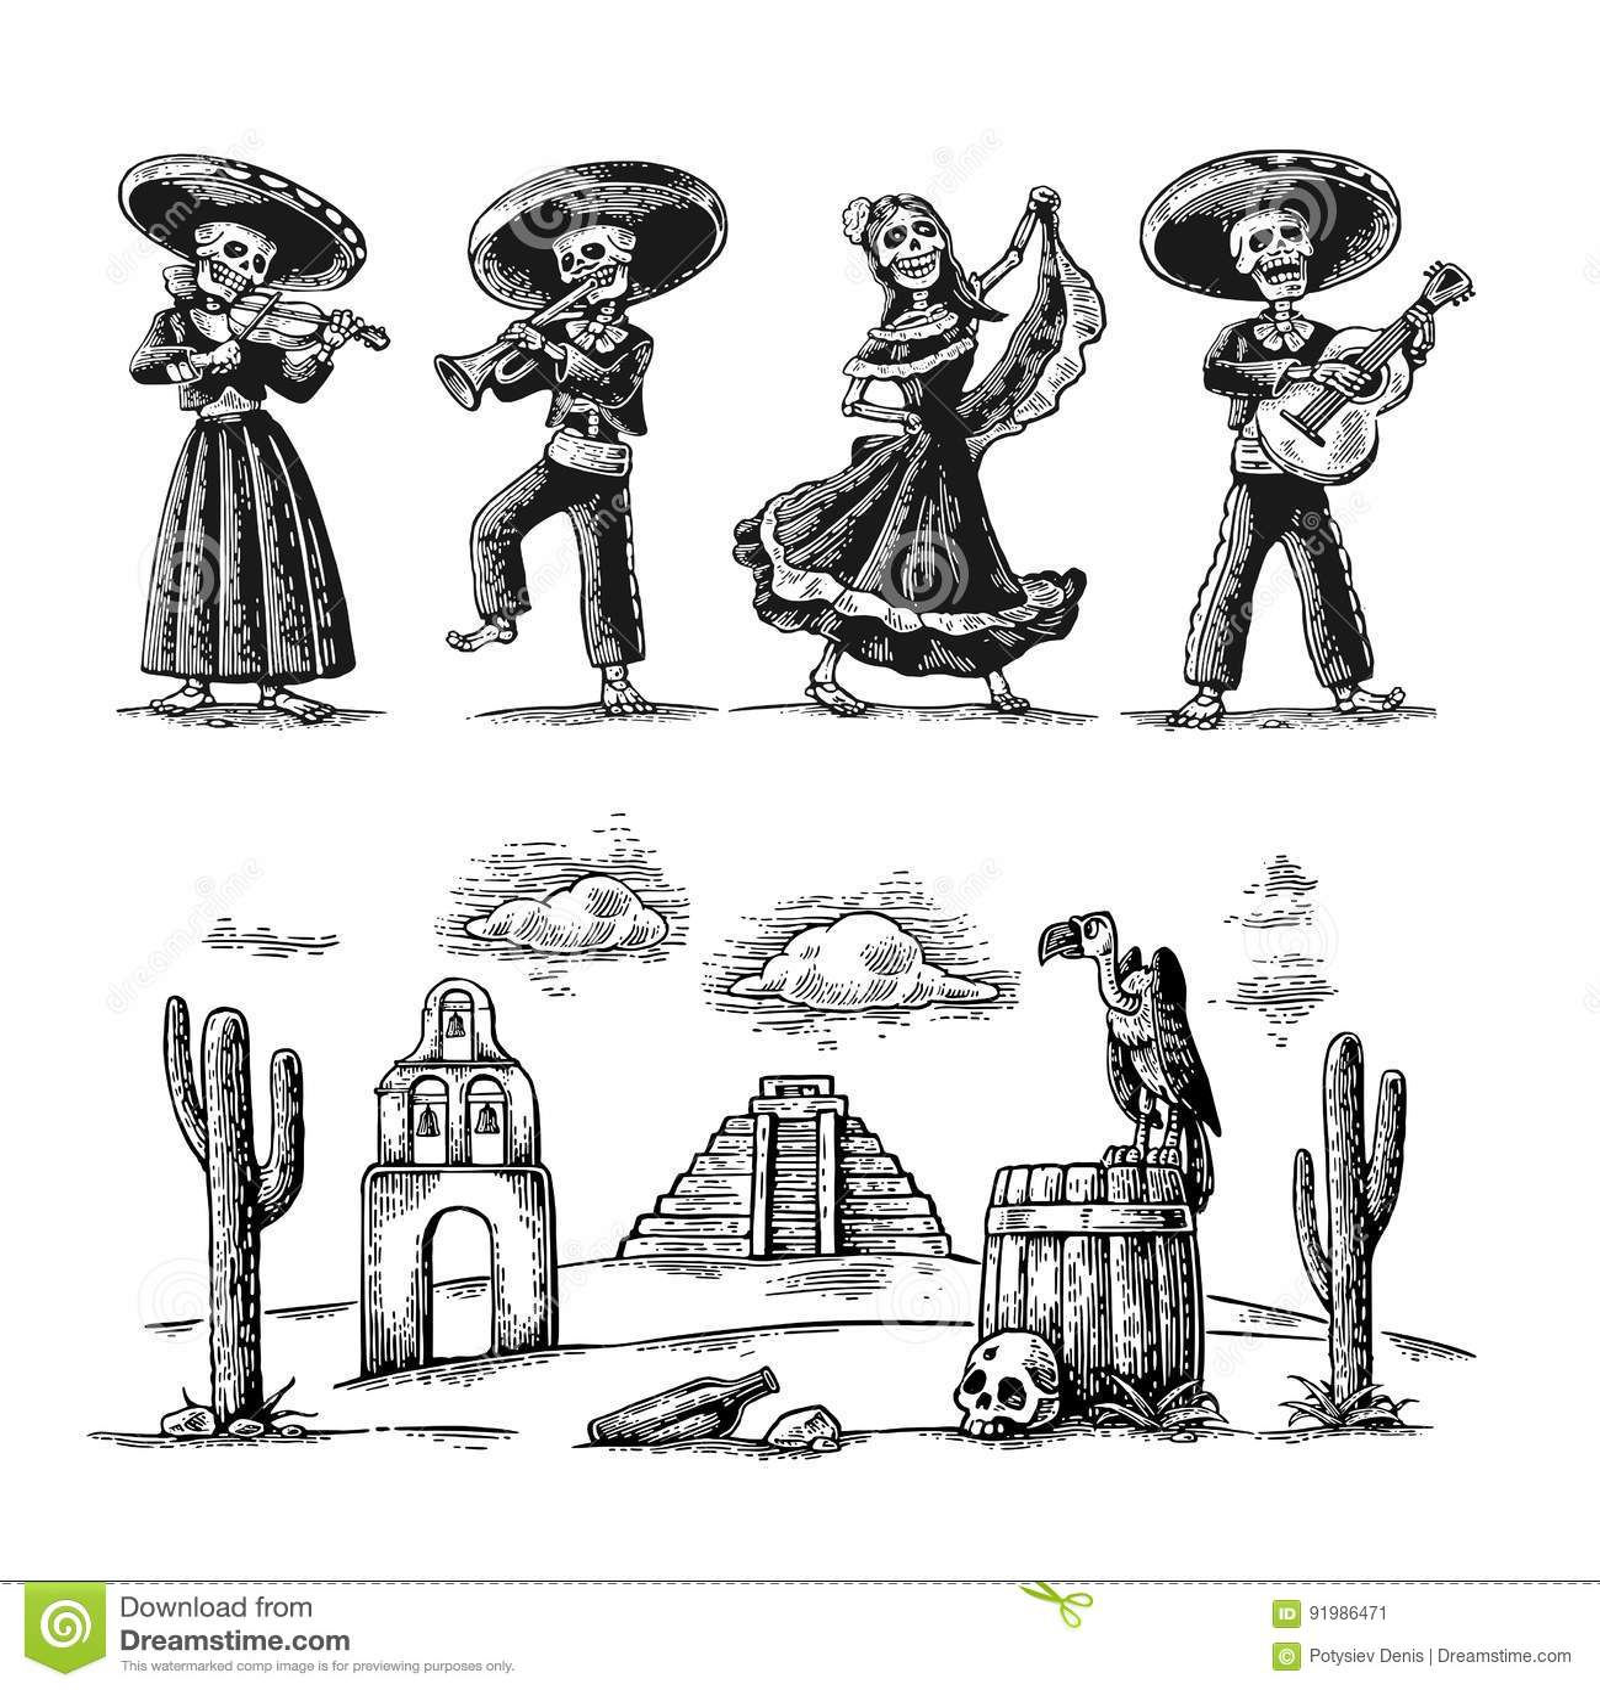 wiring diagram database  day of the dead dia de los muertos the skeleton in  the